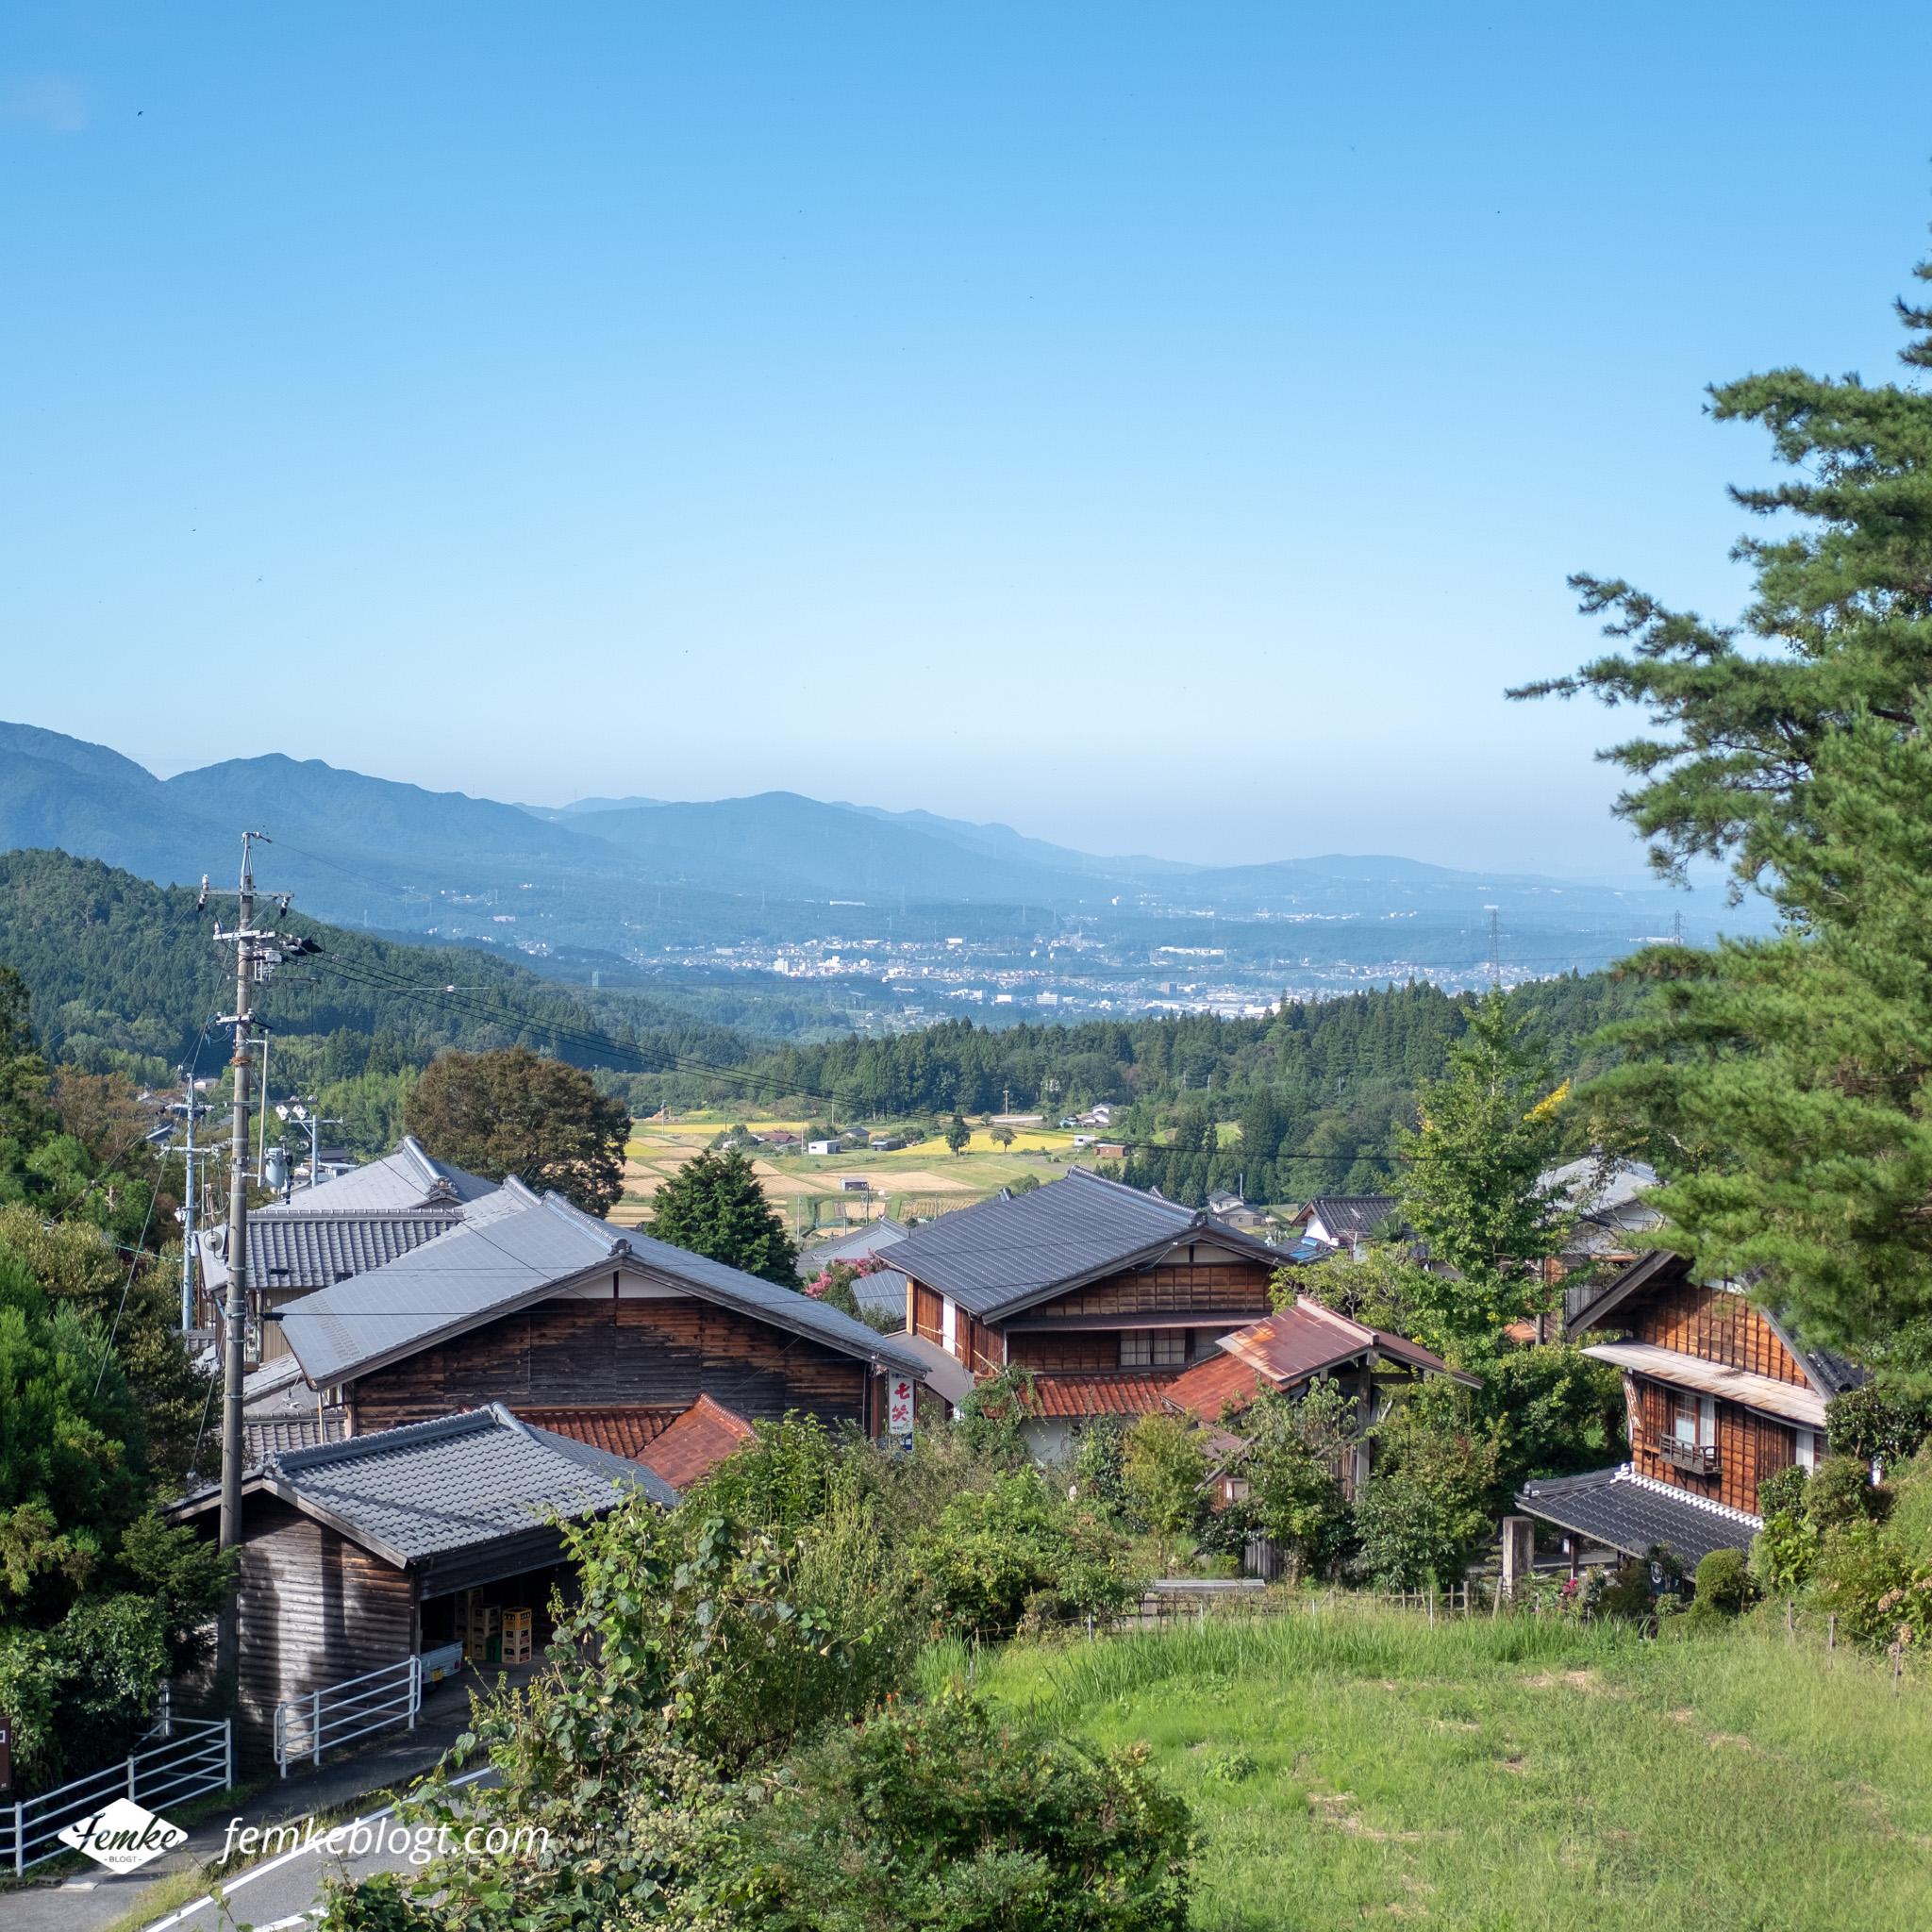 Nakasendo trail van Magome naar Tsumago in Japan